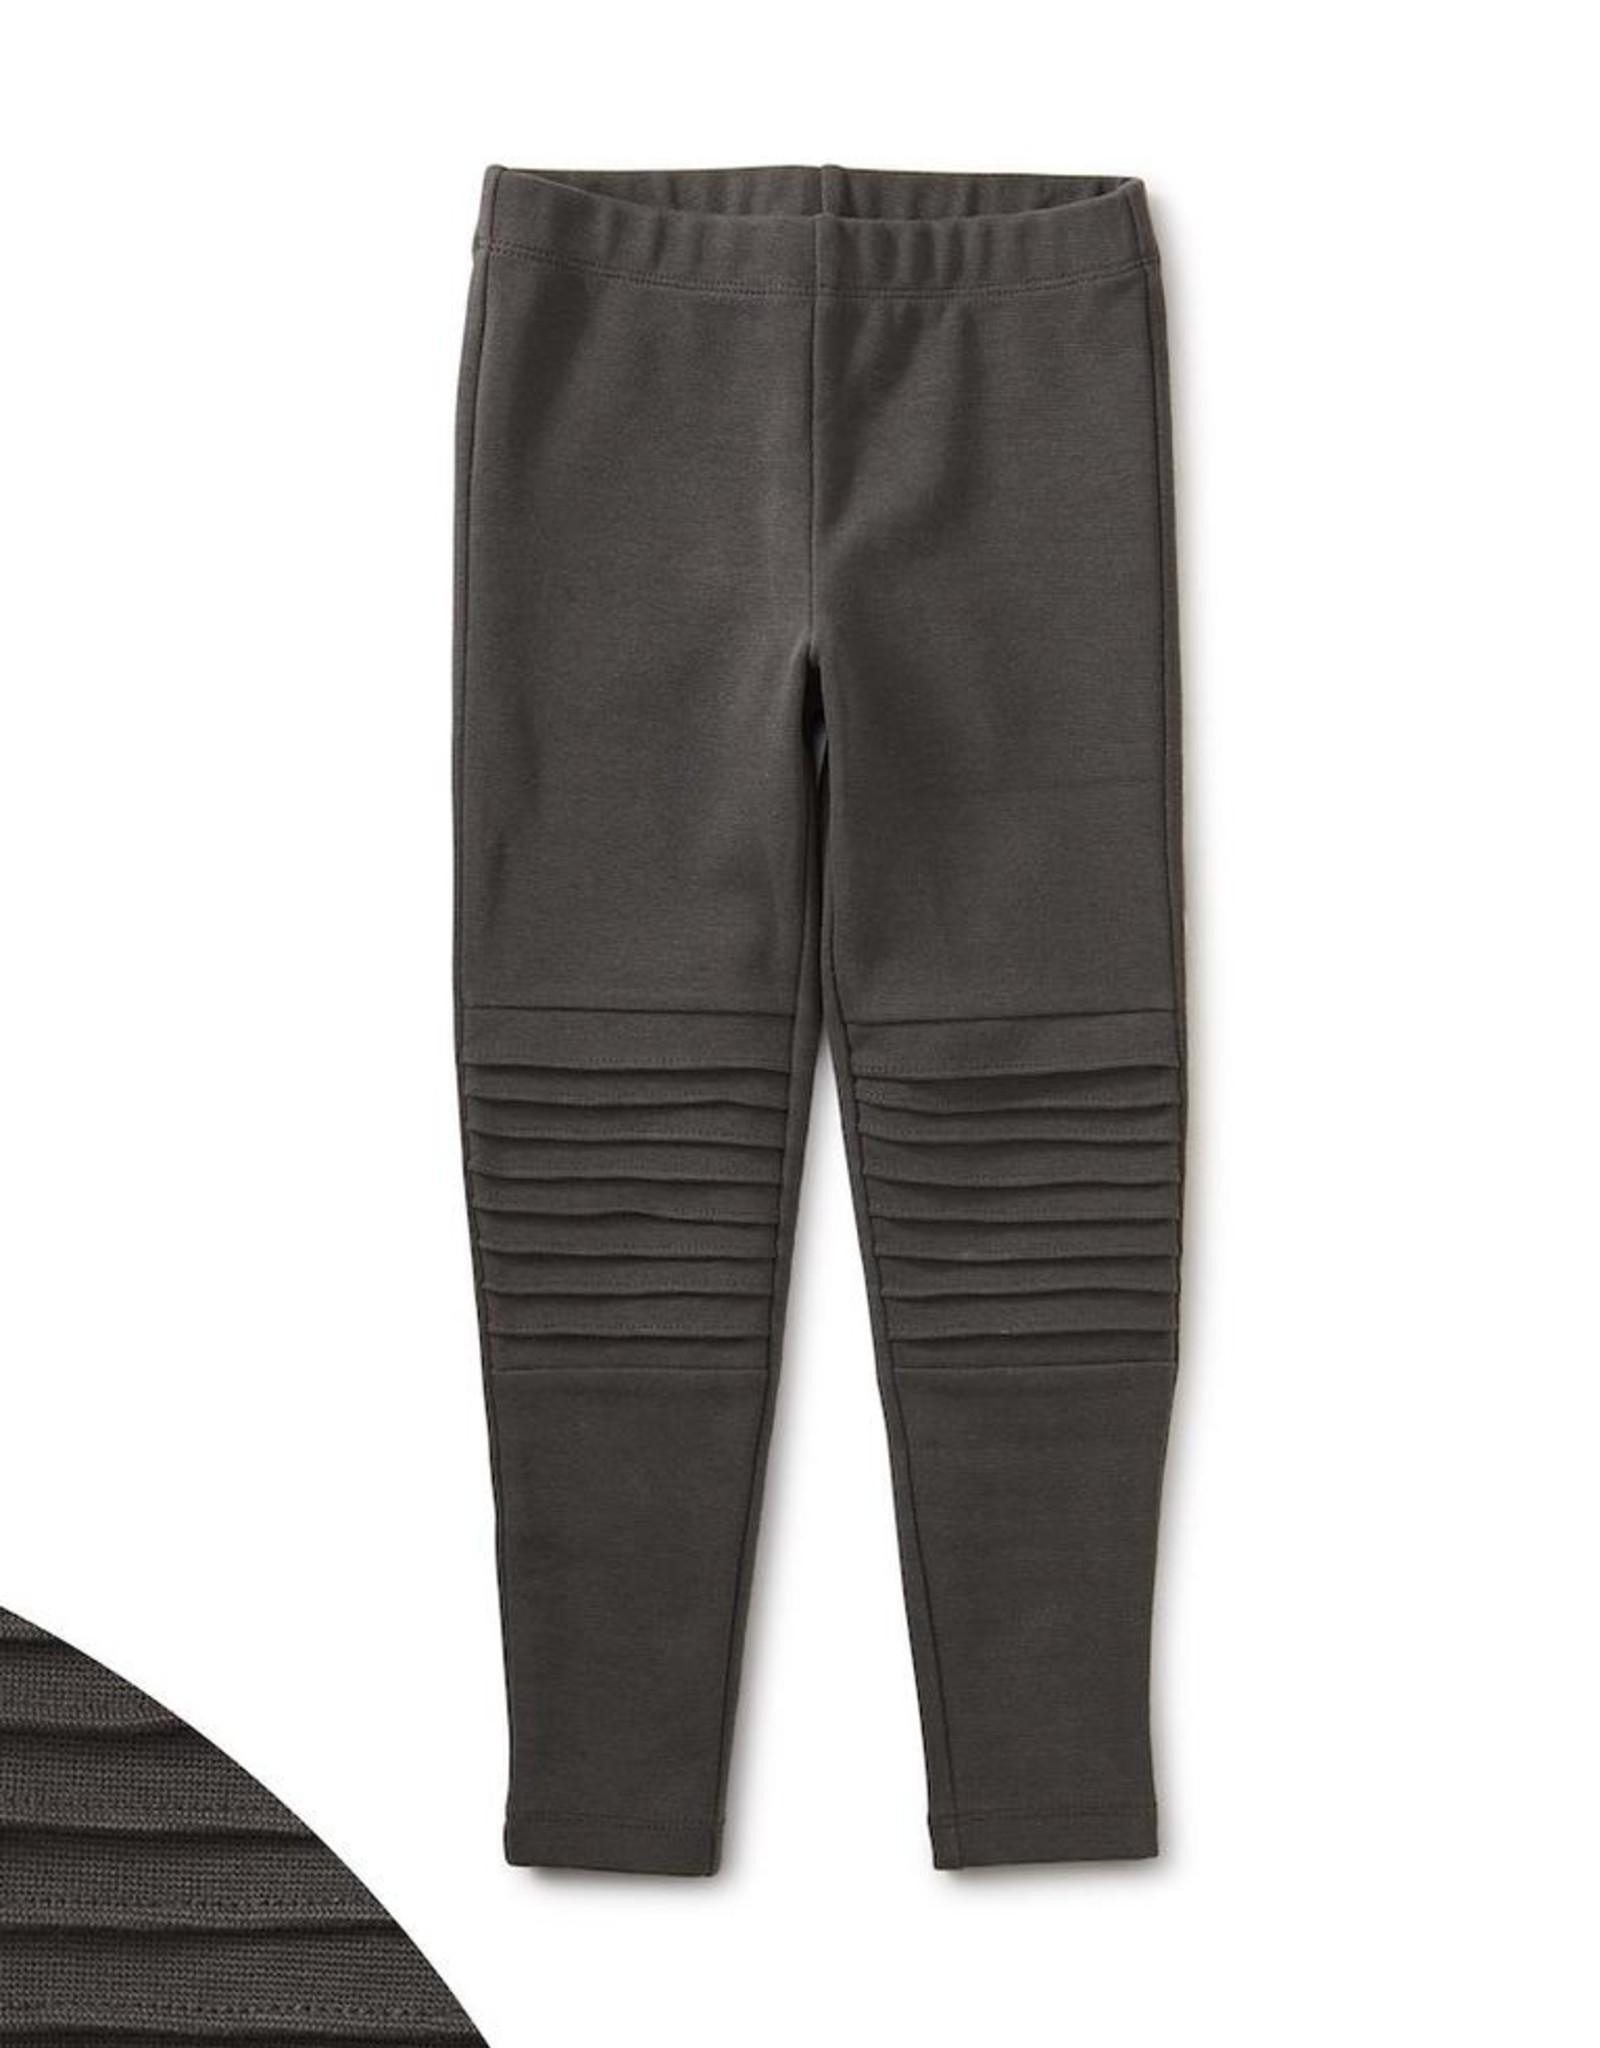 Tea Collection Grey Reinforced Knee Moto Pants